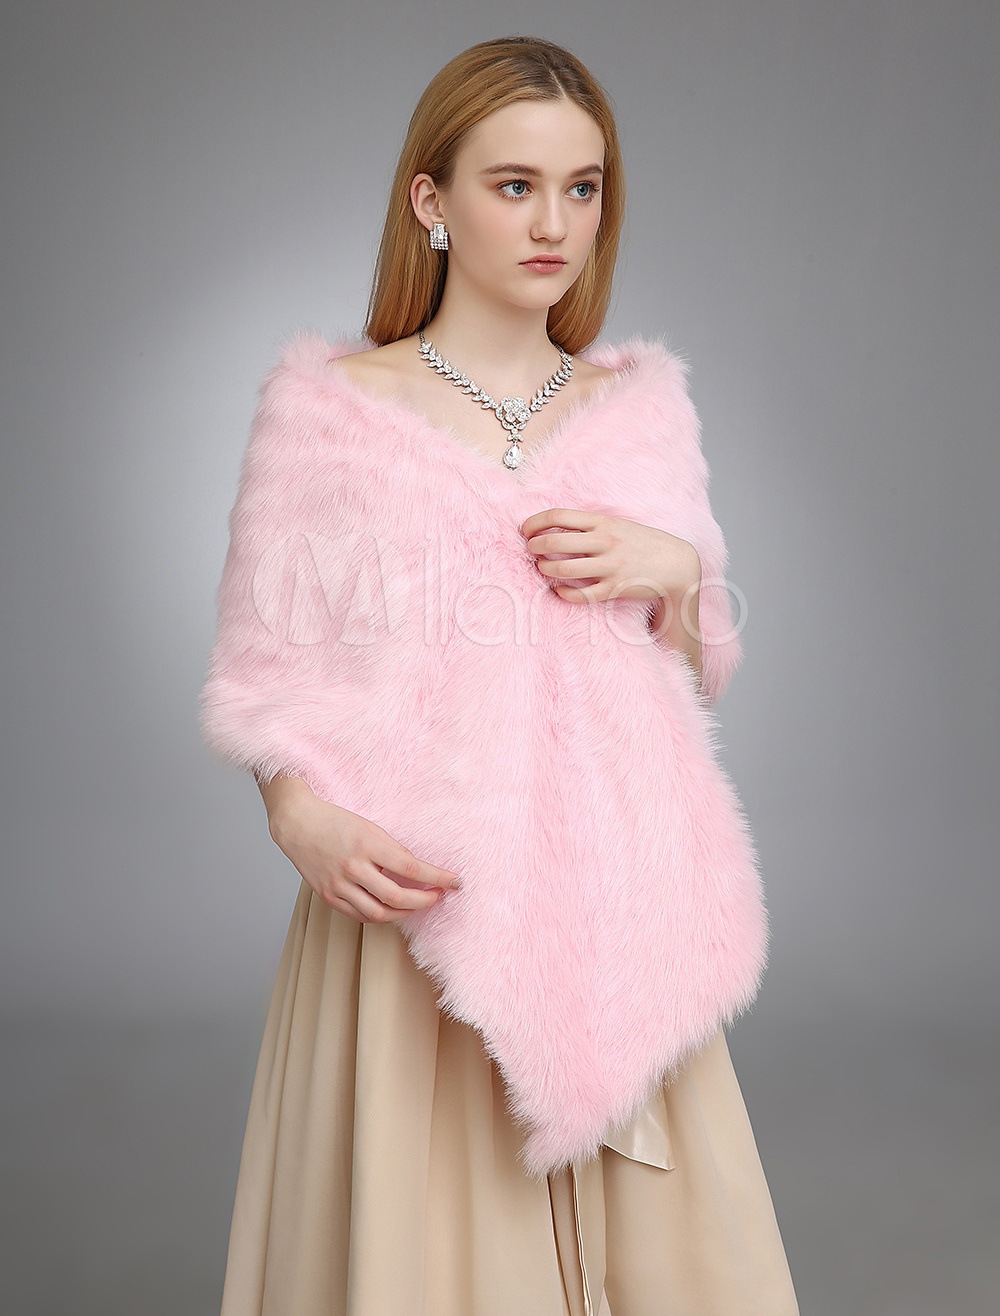 Pink Wedding Shawl With Faux Fur $29.99 AT vintagedancer.com